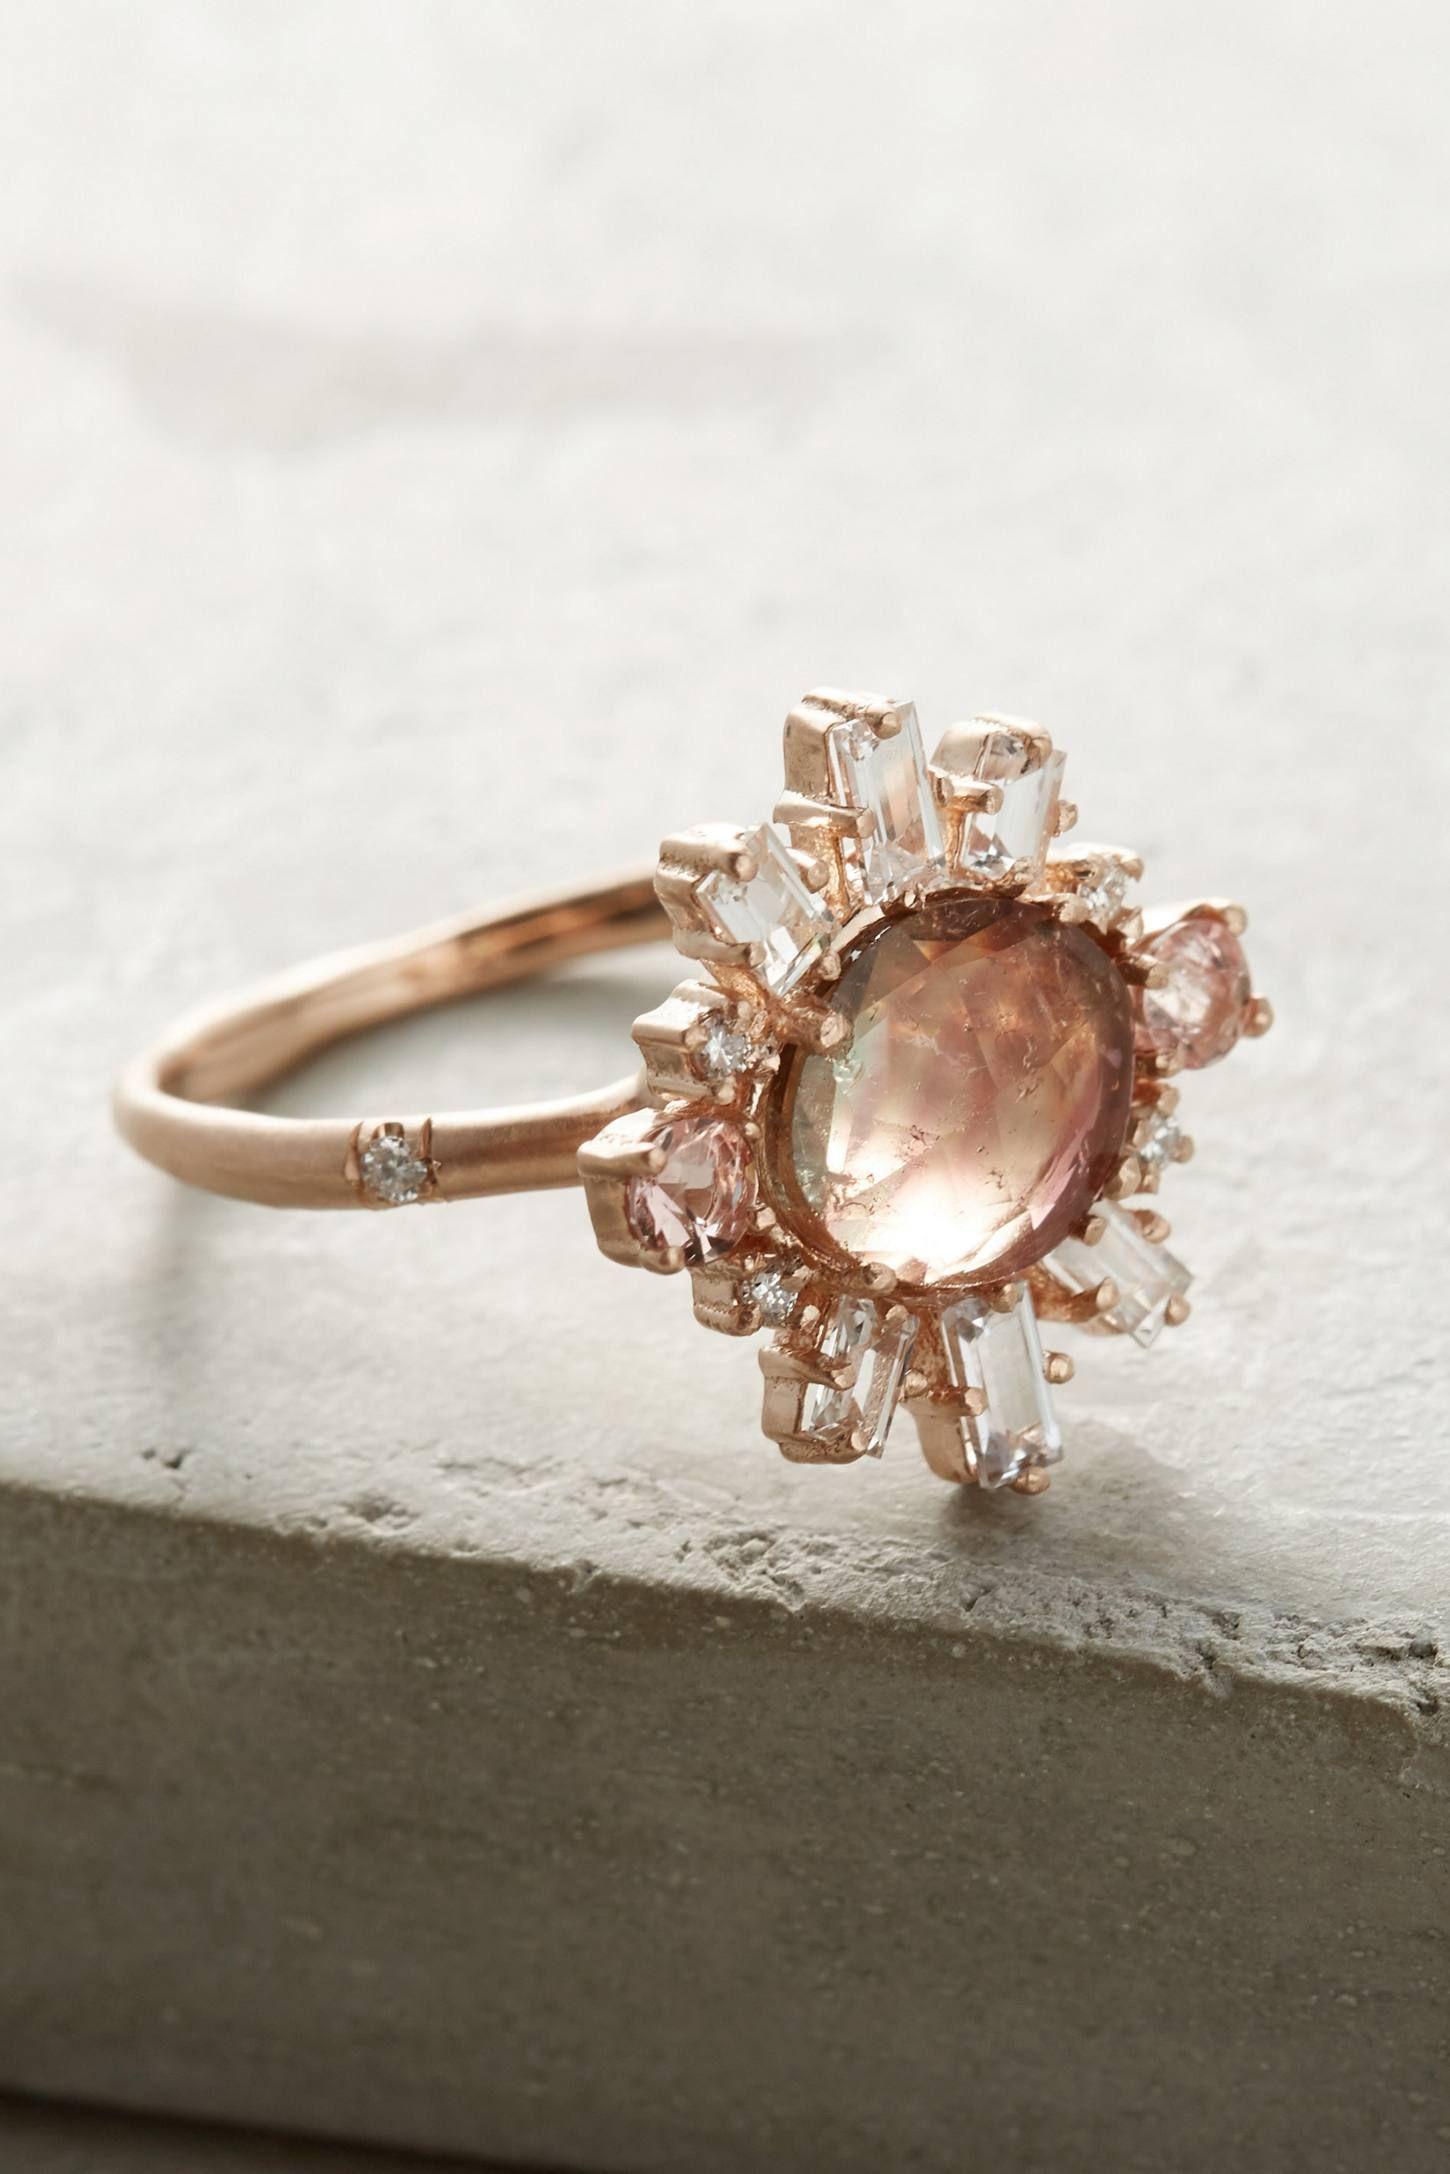 Fireburst Tourmaline Ring